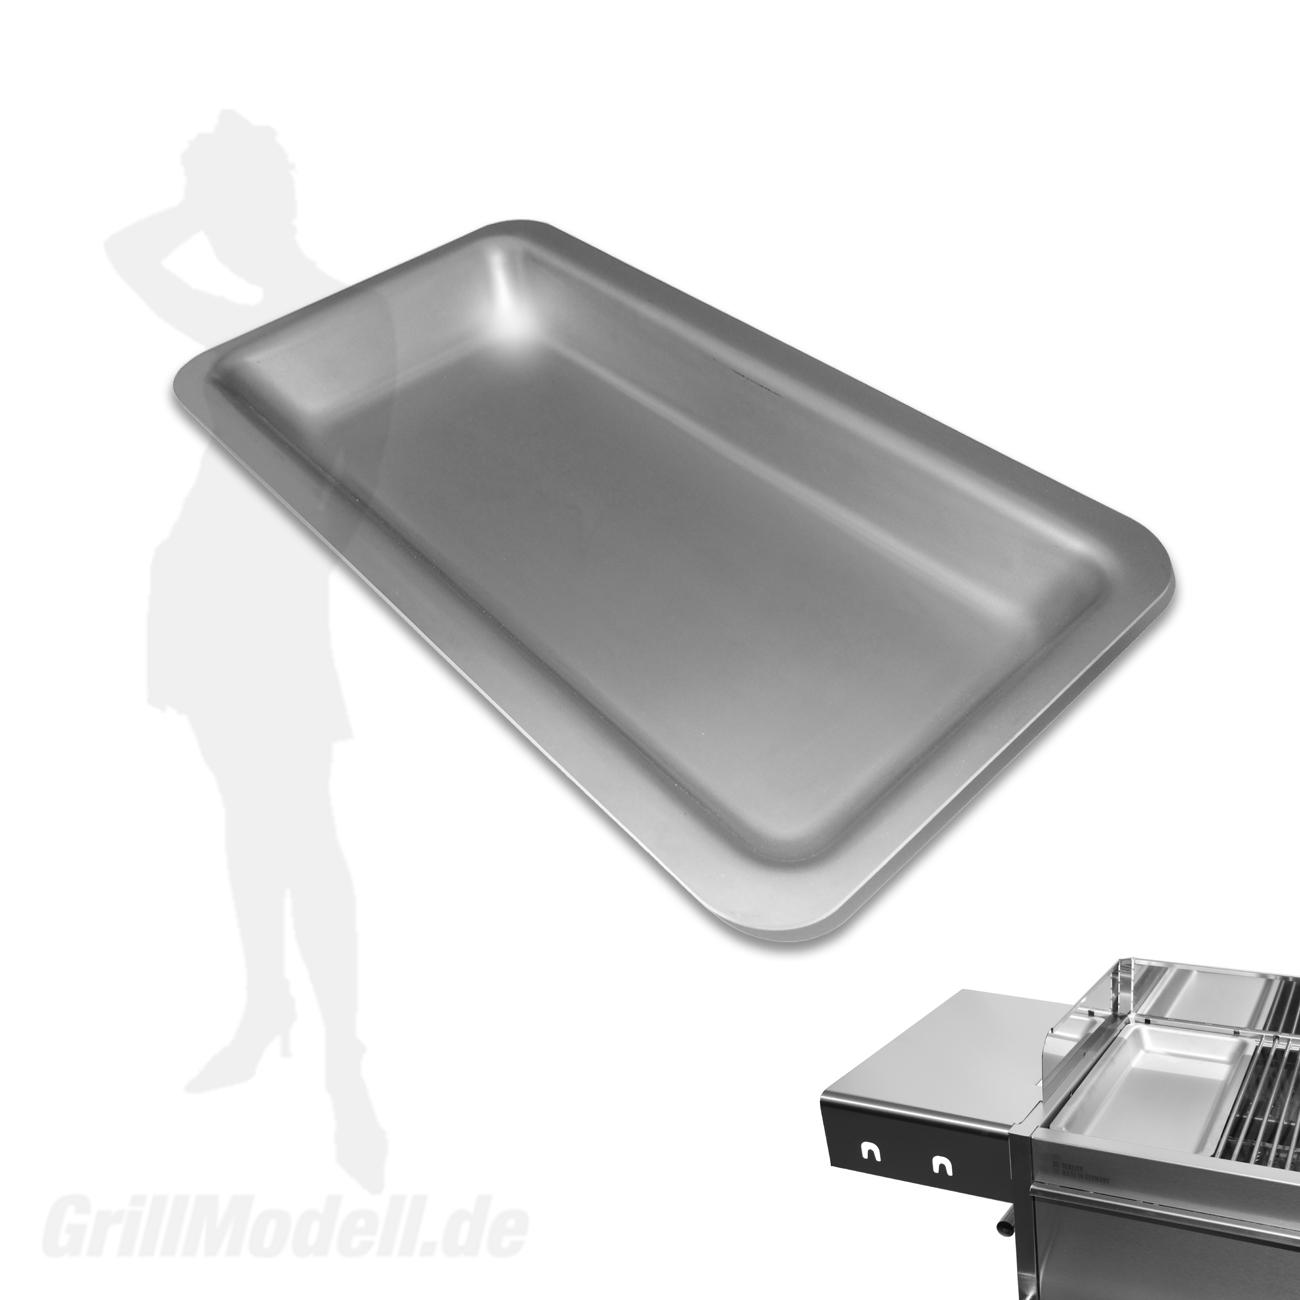 Edelstahl Grillplatte für Edelstahlgrill Holzkohlegrill Edelstar XL